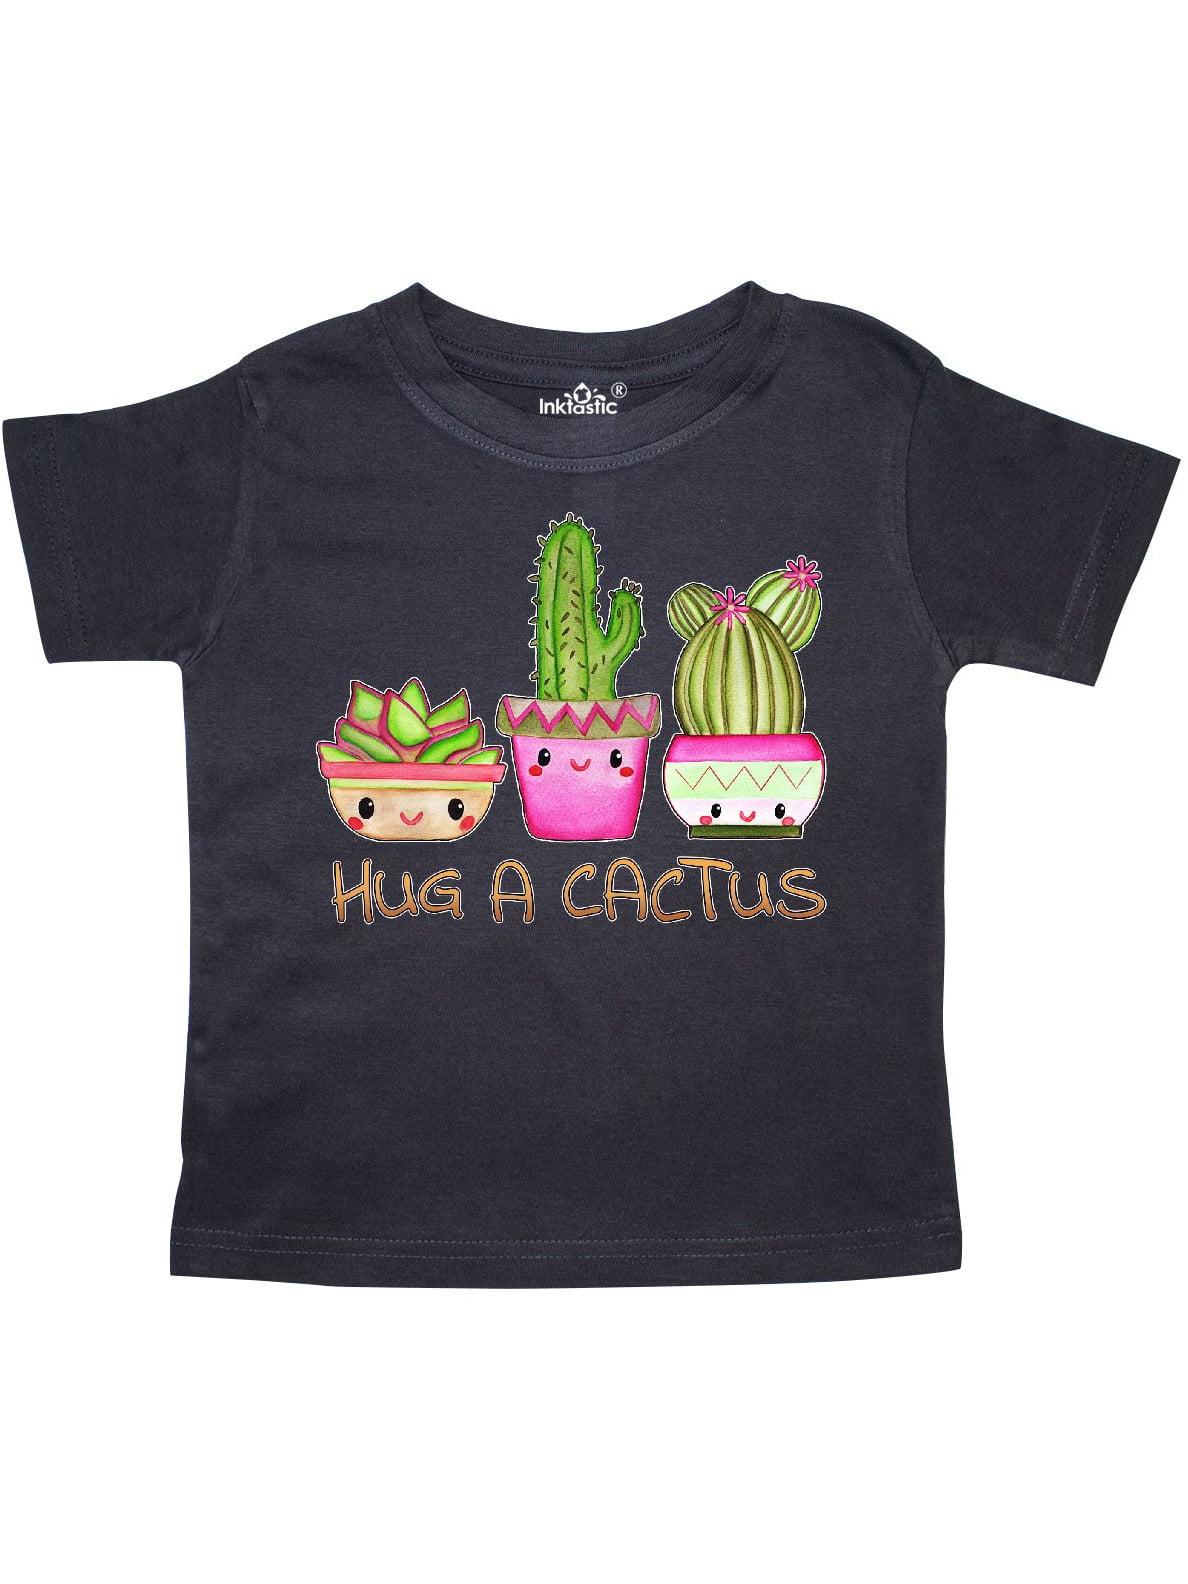 19ccaeda8 Inktastic - Hug a Cactus- cute Toddler T-Shirt - Walmart.com